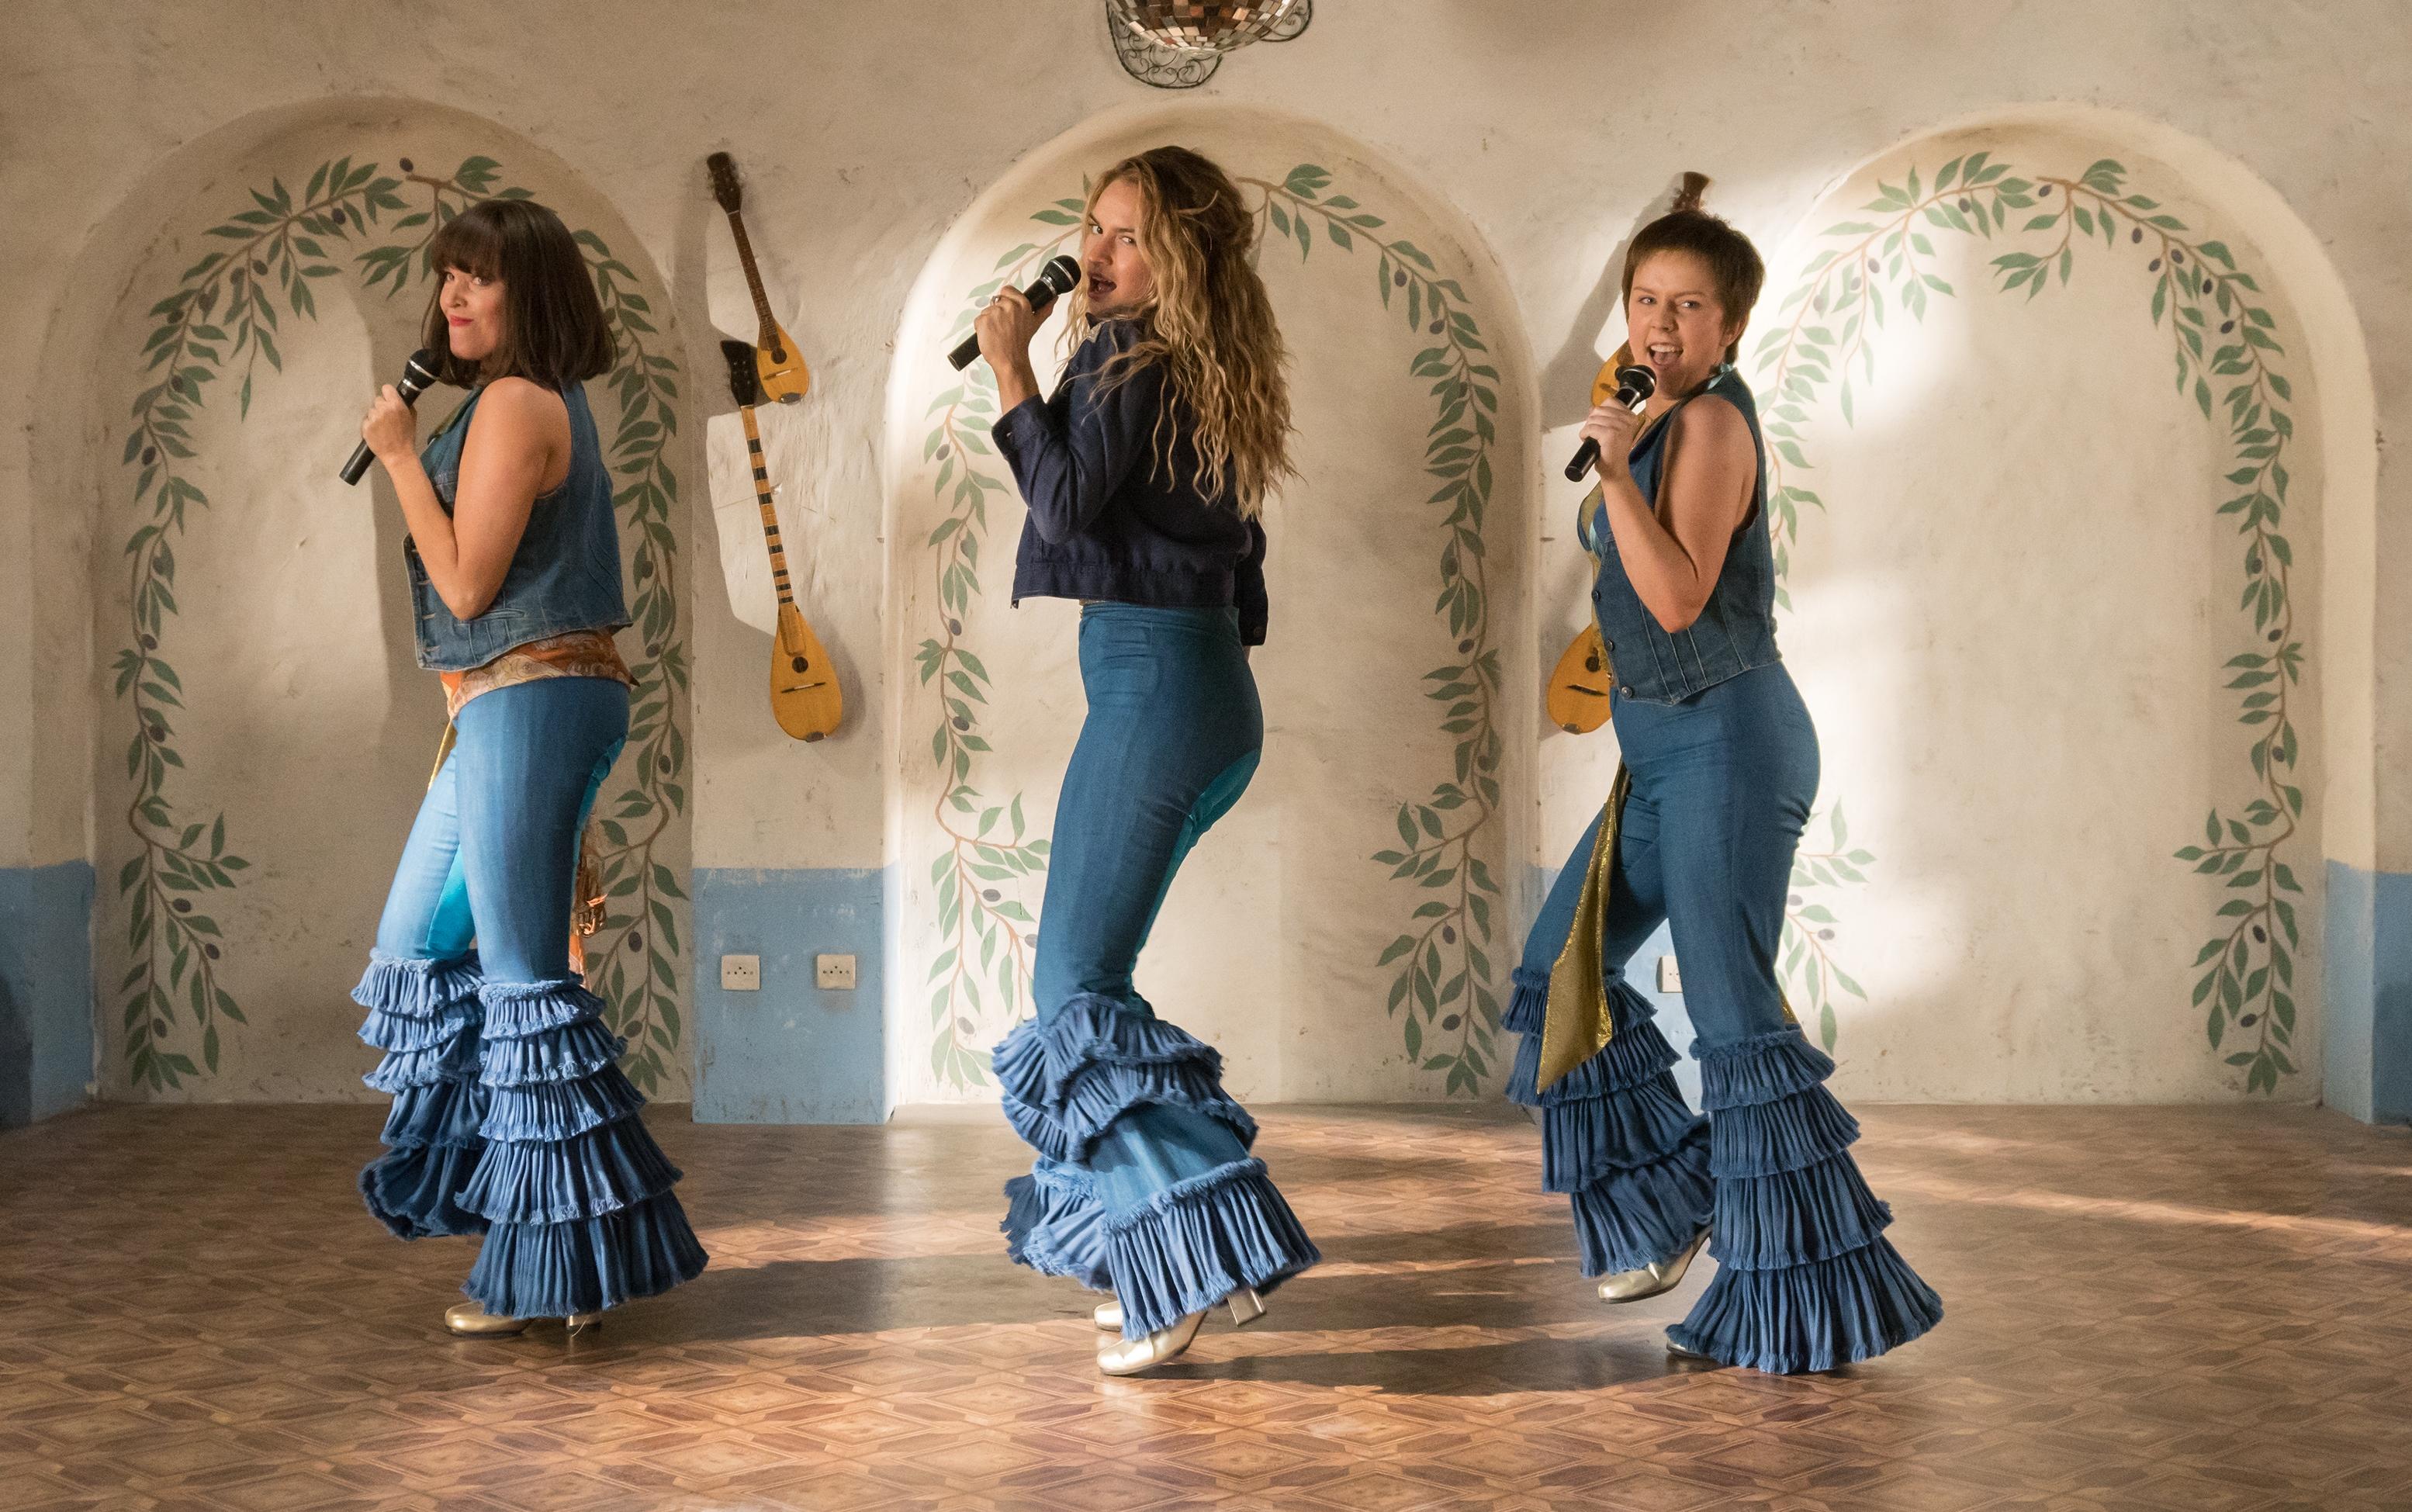 Crítica | Mamma Mia! Here We Go Again (2018)